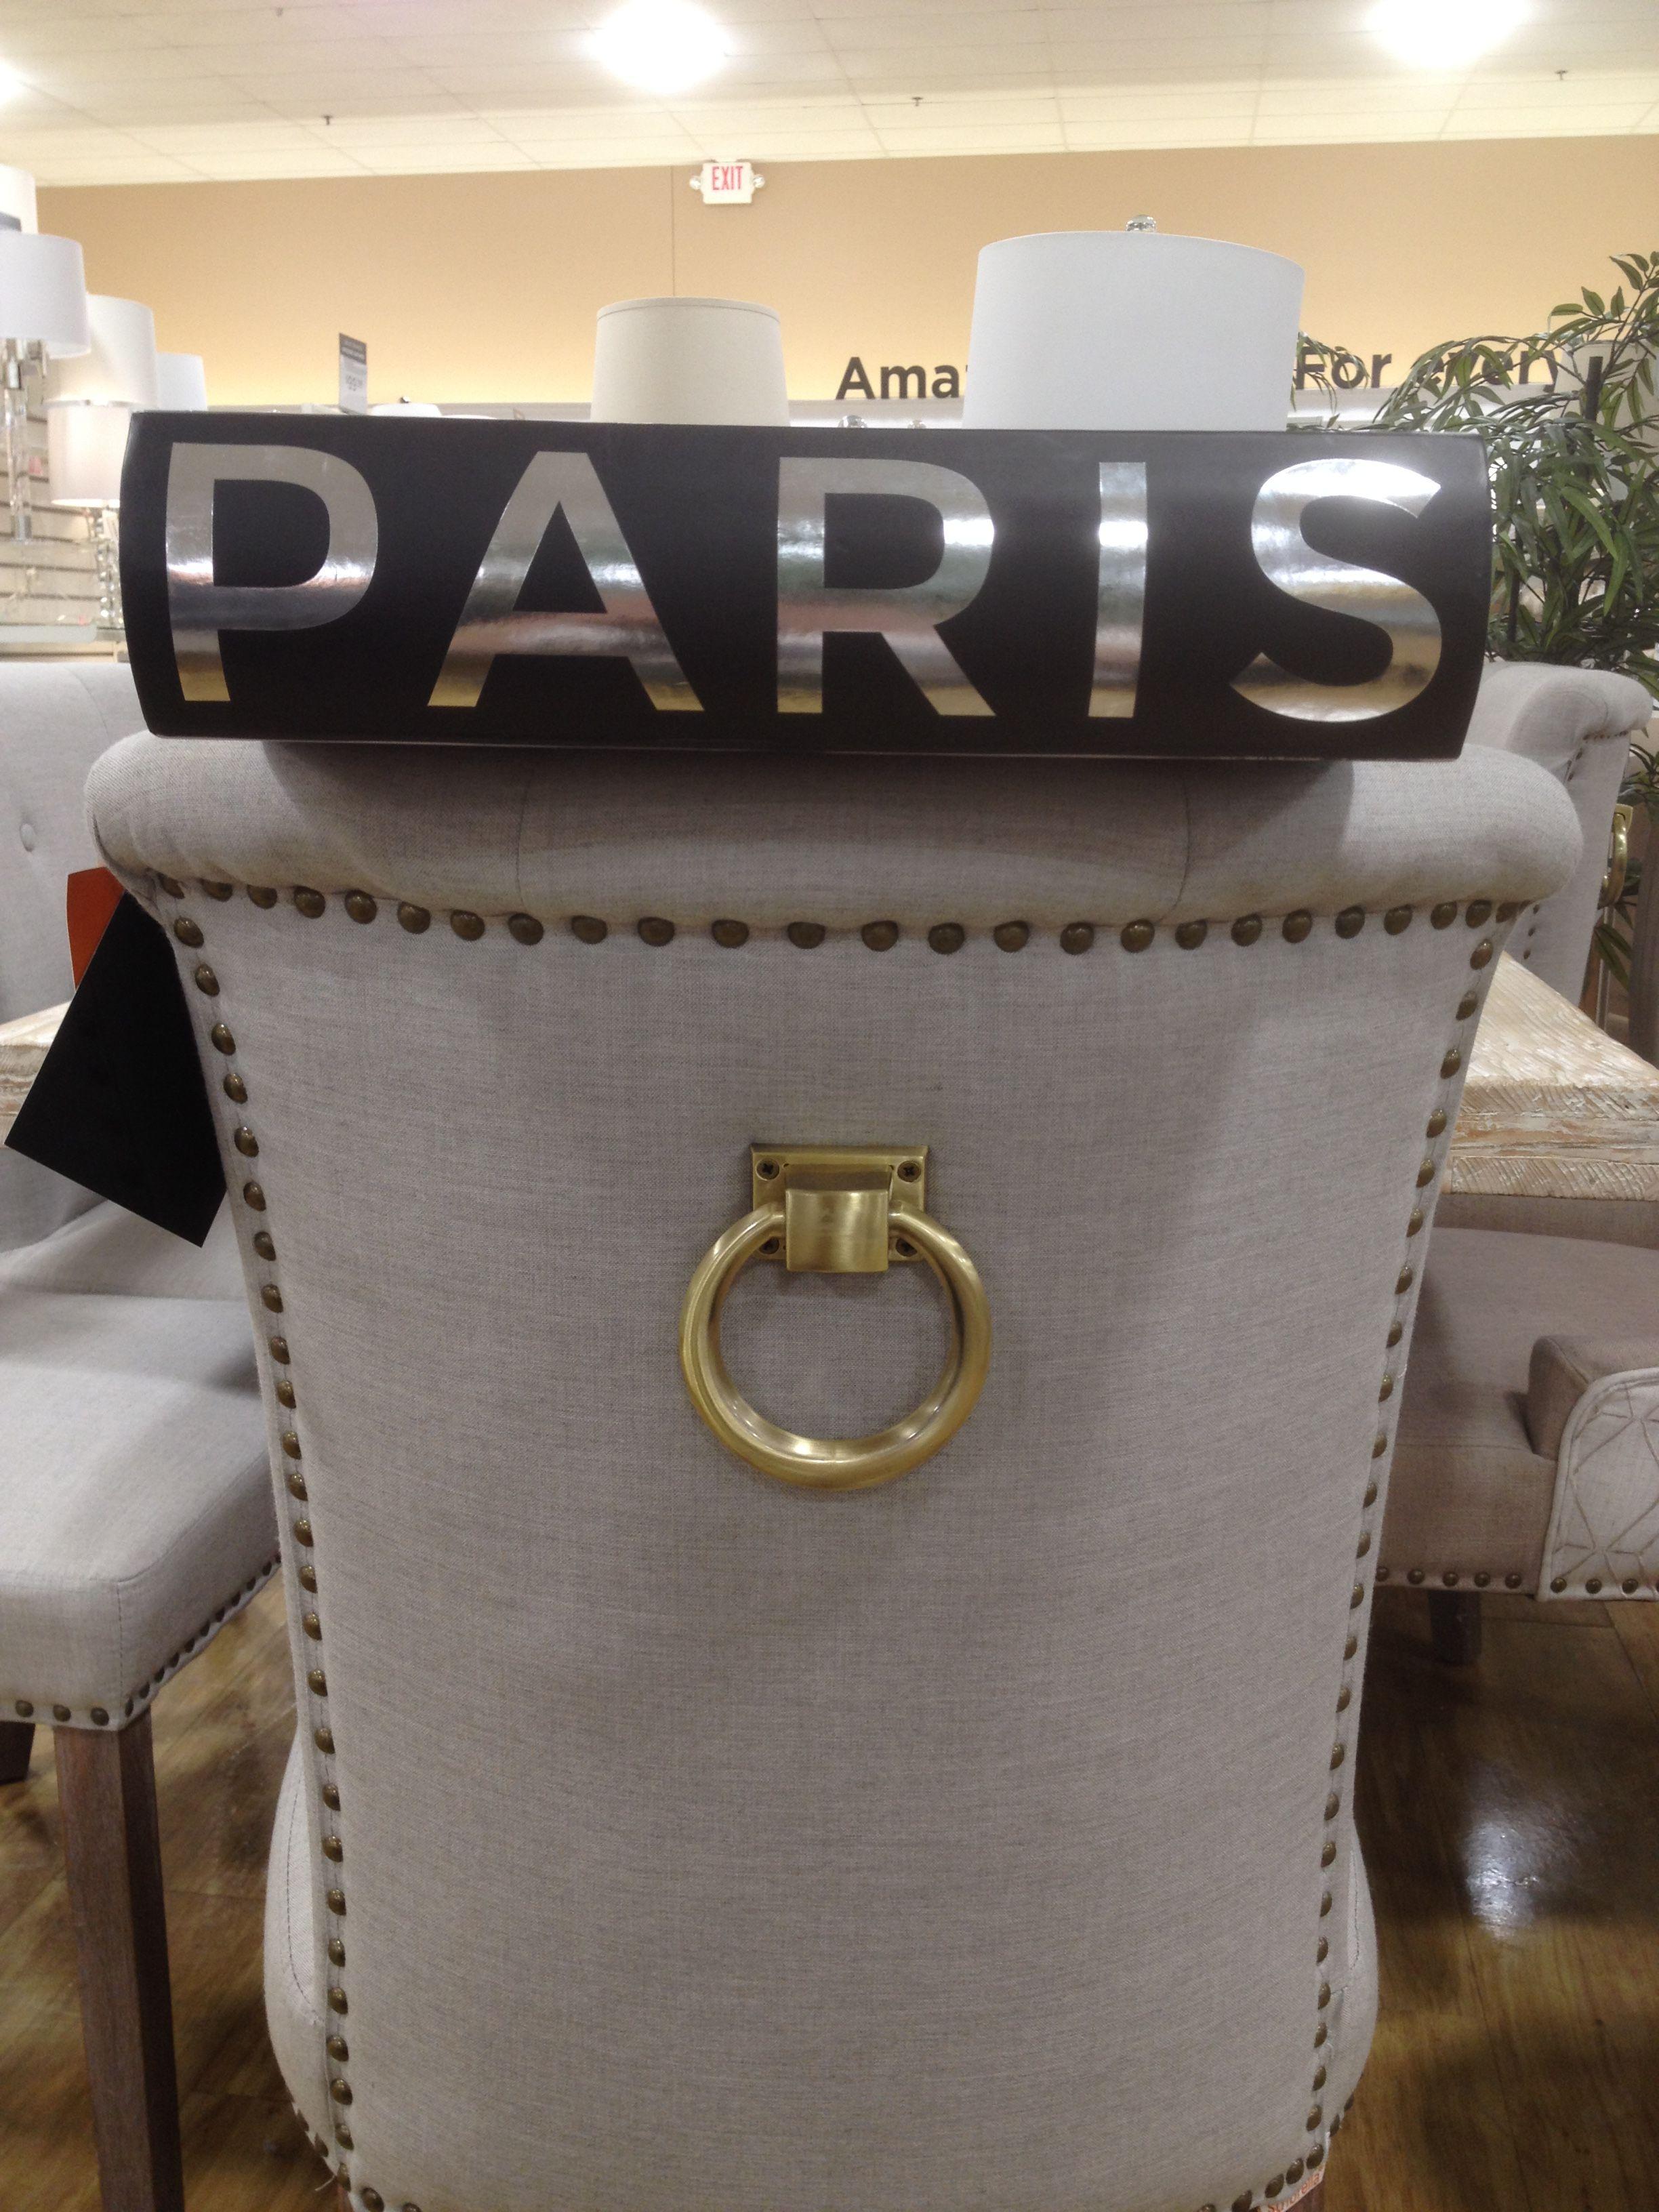 30/30/17 - Grey-beige chair - Gold doorknocker style accent - Nail head trim